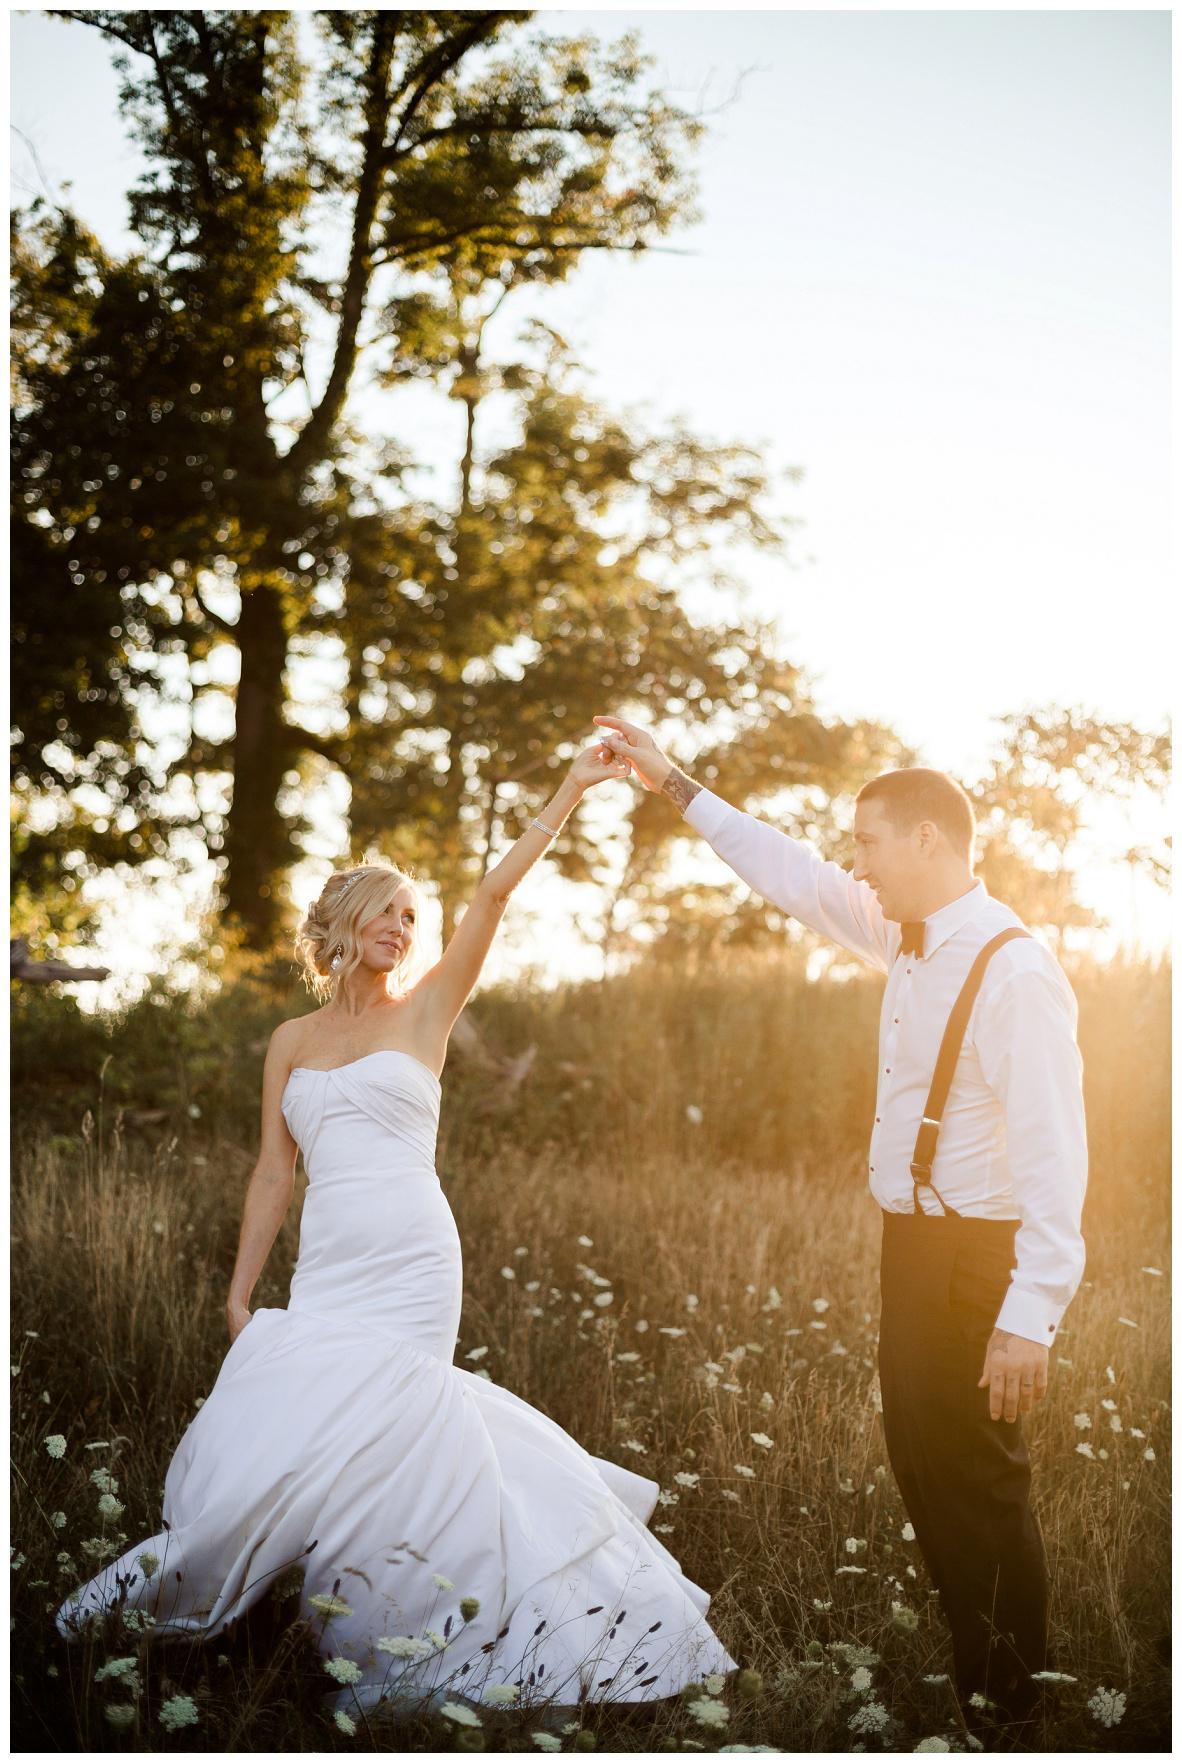 Mr. and Mrs. Papp_0076m.jpg